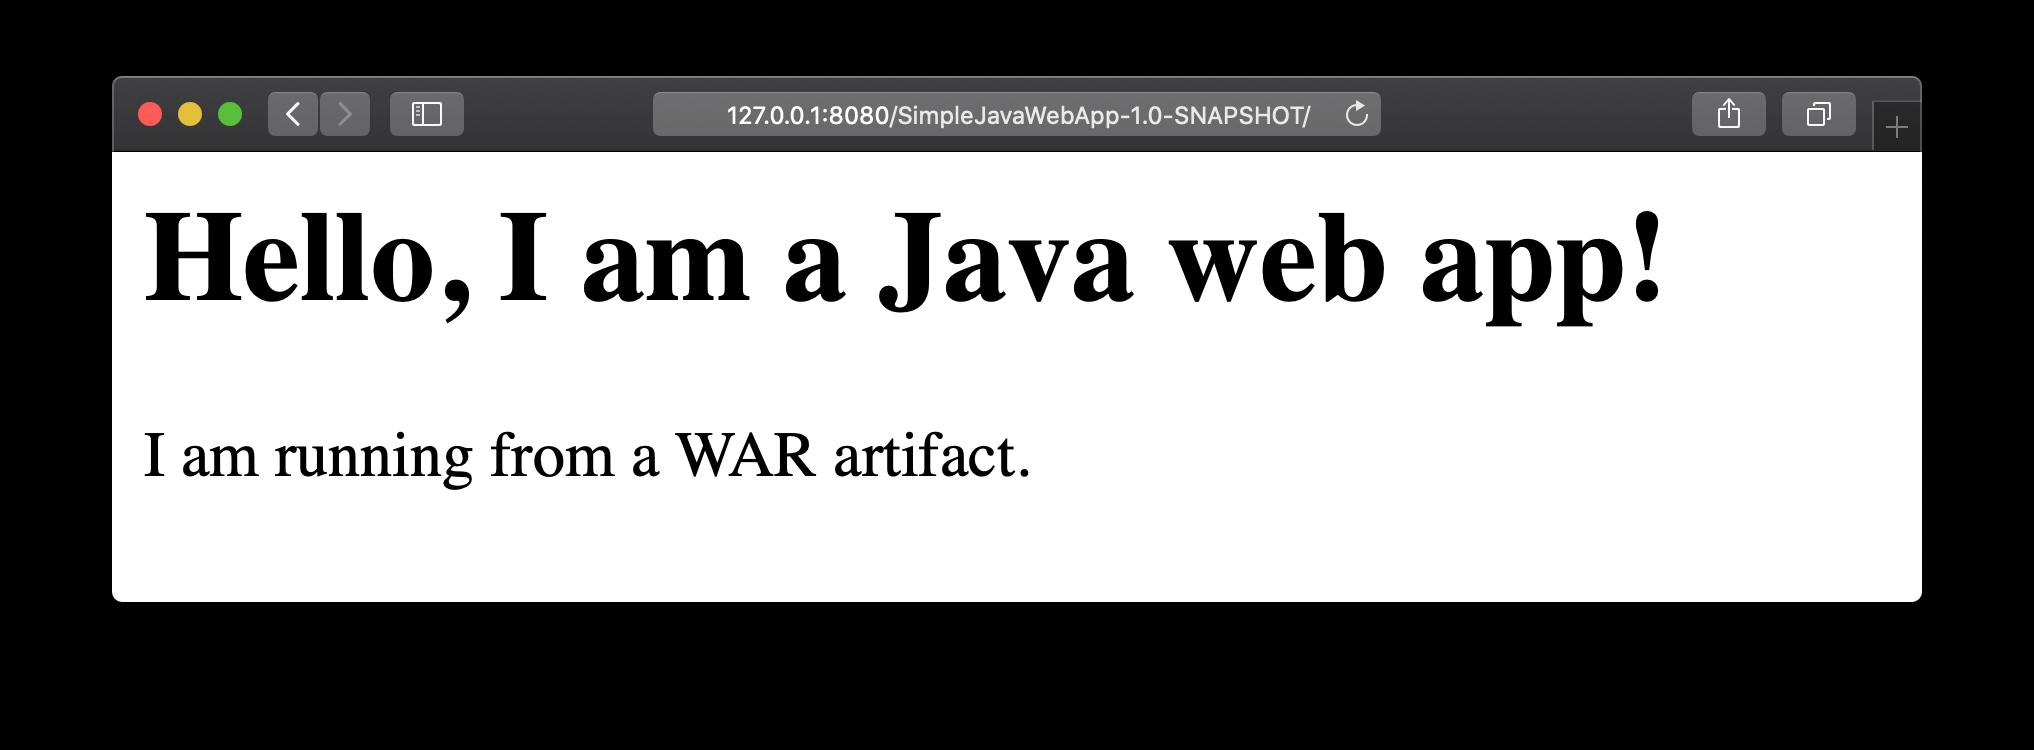 Simple Java Web App Demo page